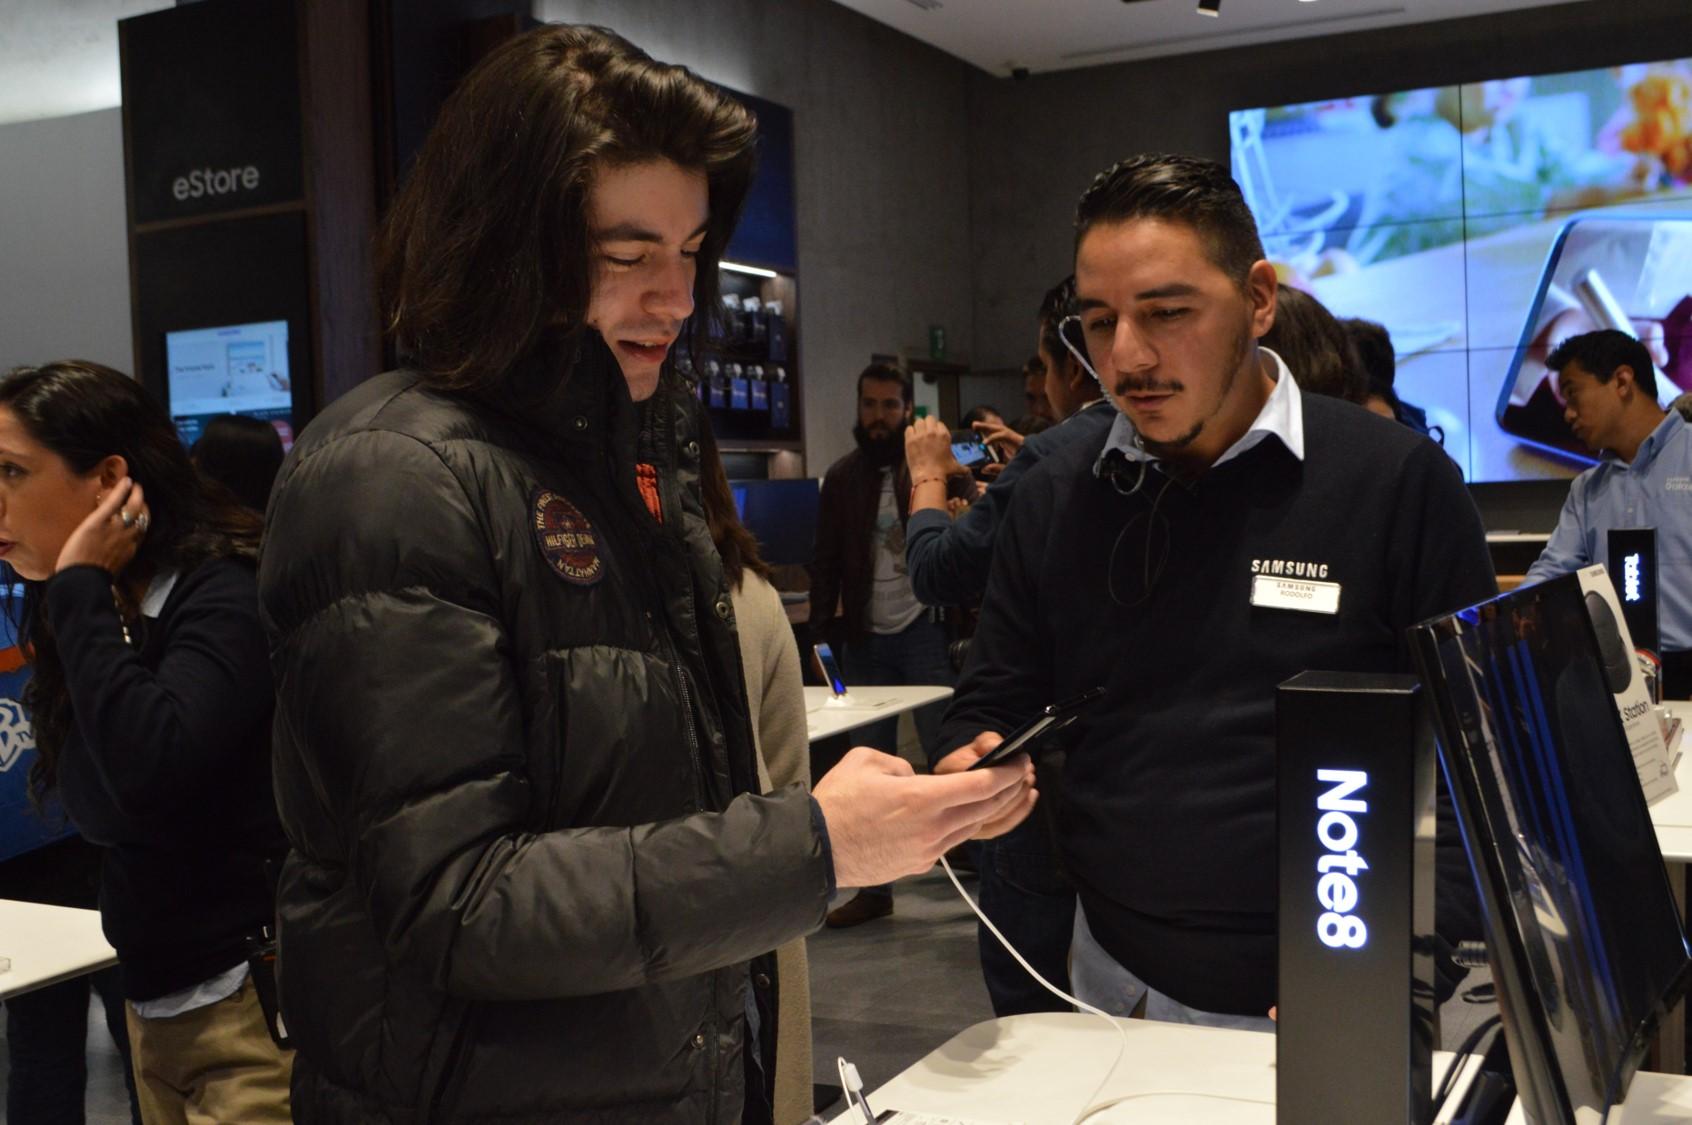 Samsung Experience Store smartphones